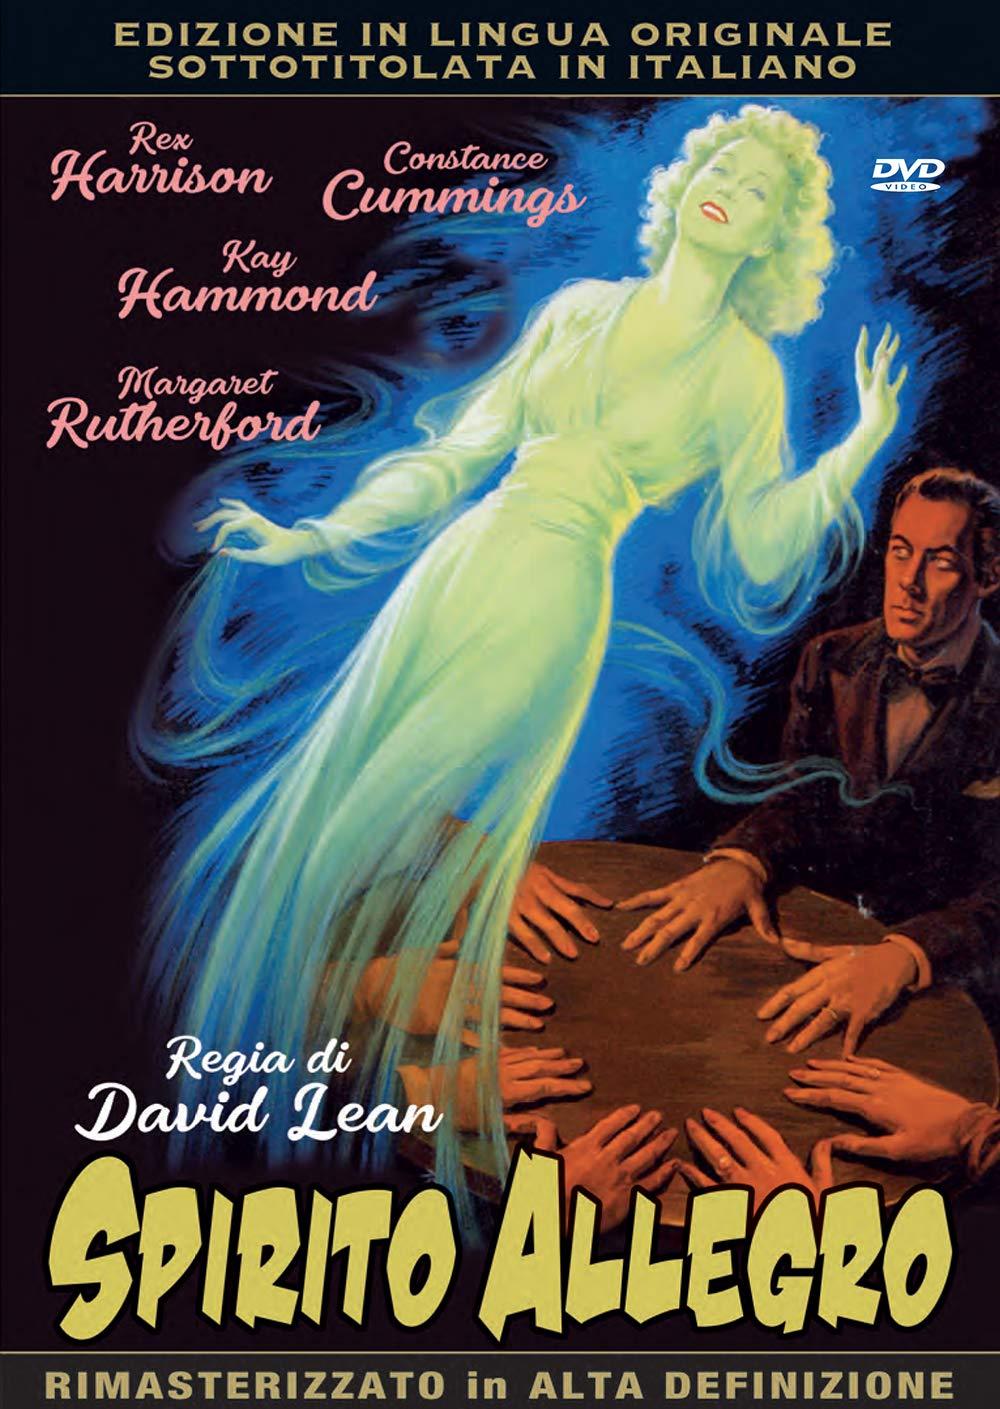 SPIRITO ALLEGRO (DVD)